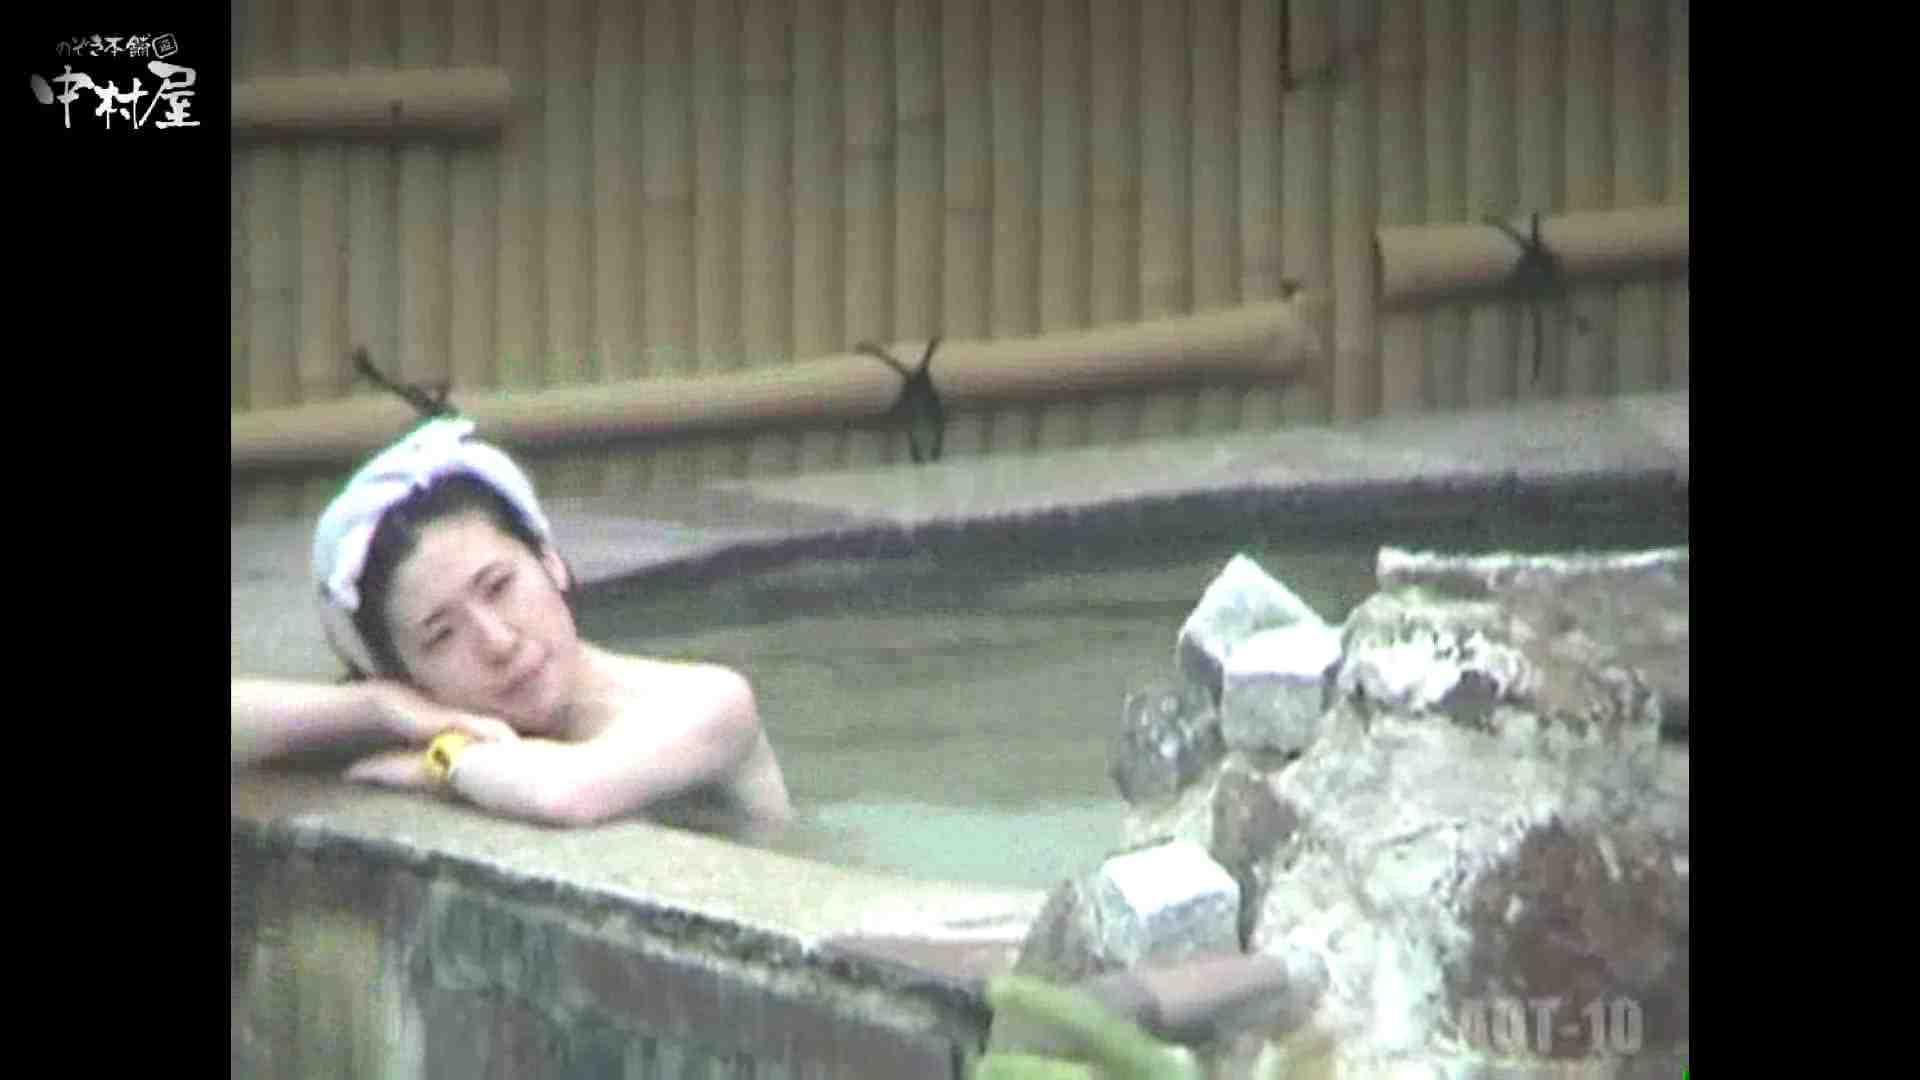 Aquaな露天風呂Vol.874潜入盗撮露天風呂十判湯 其の四 潜入 オマンコ無修正動画無料 92枚